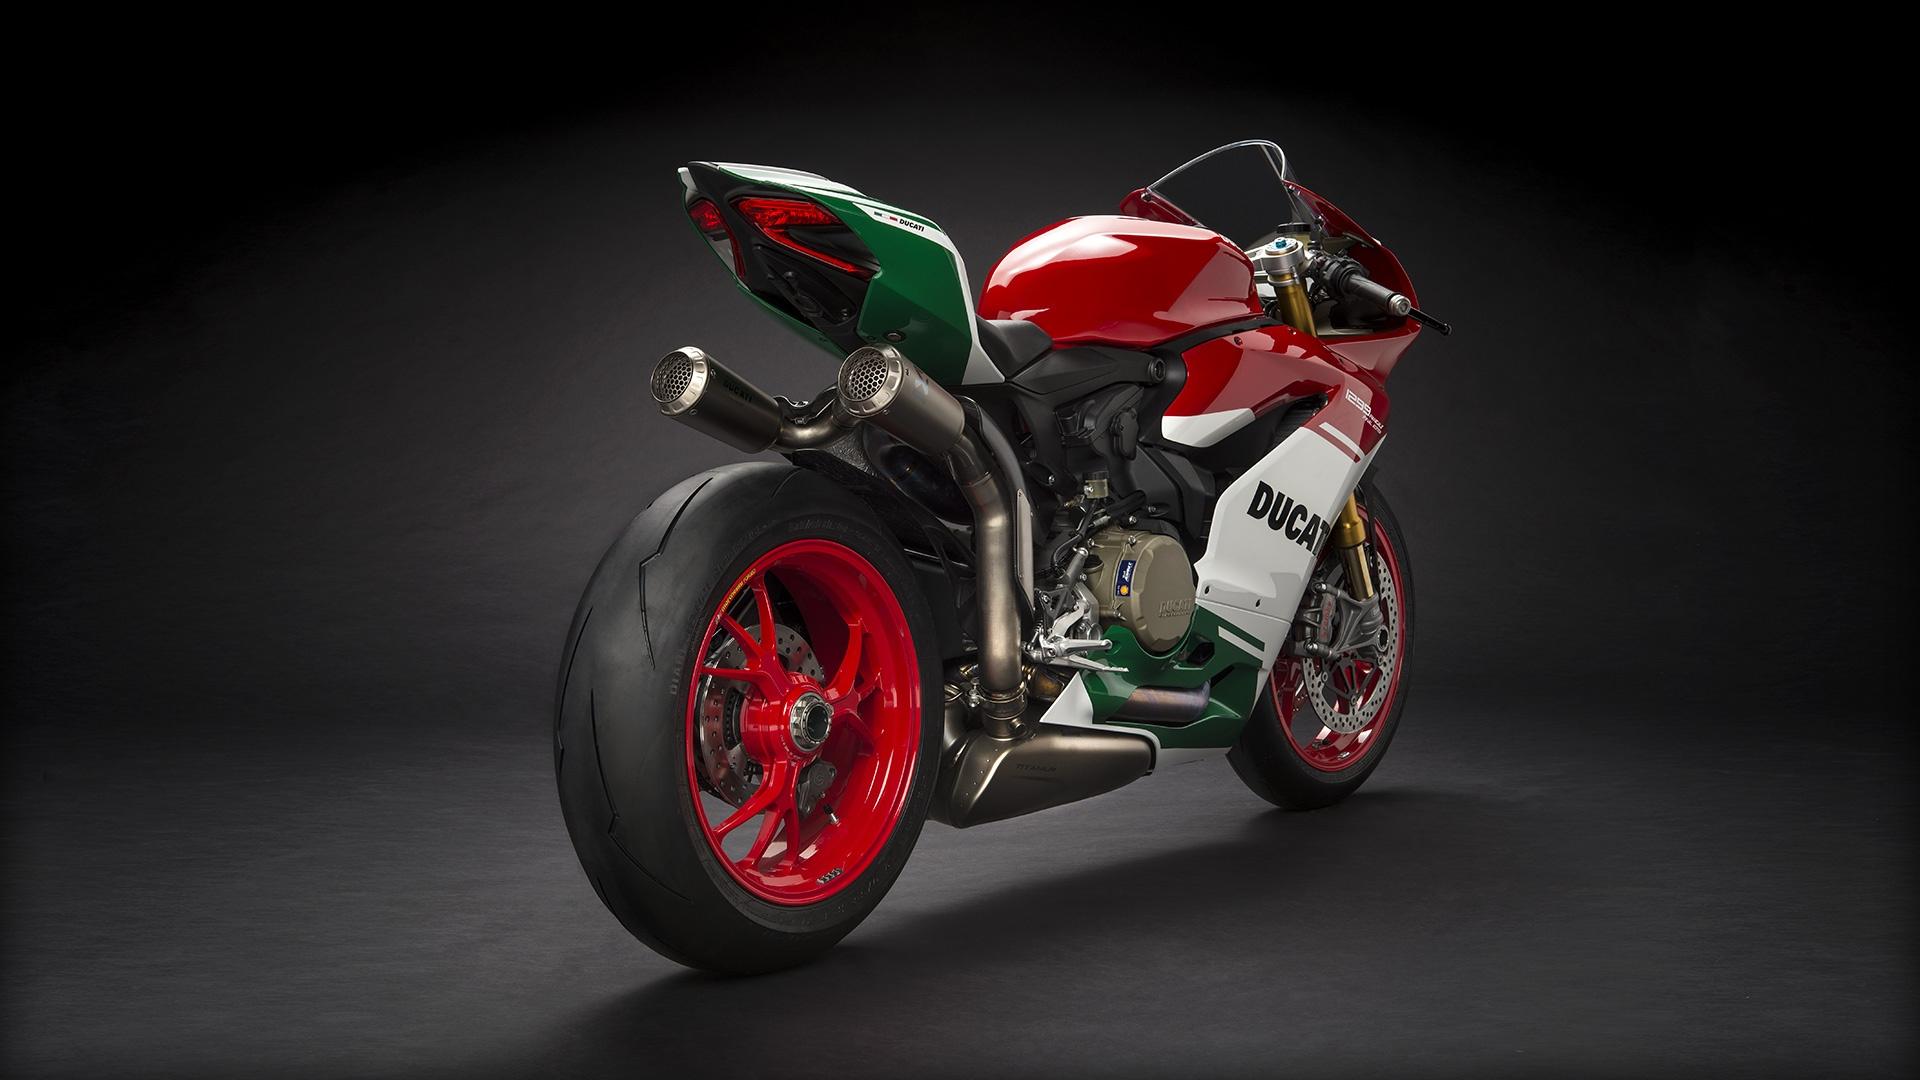 Ducati R For Sale Uk